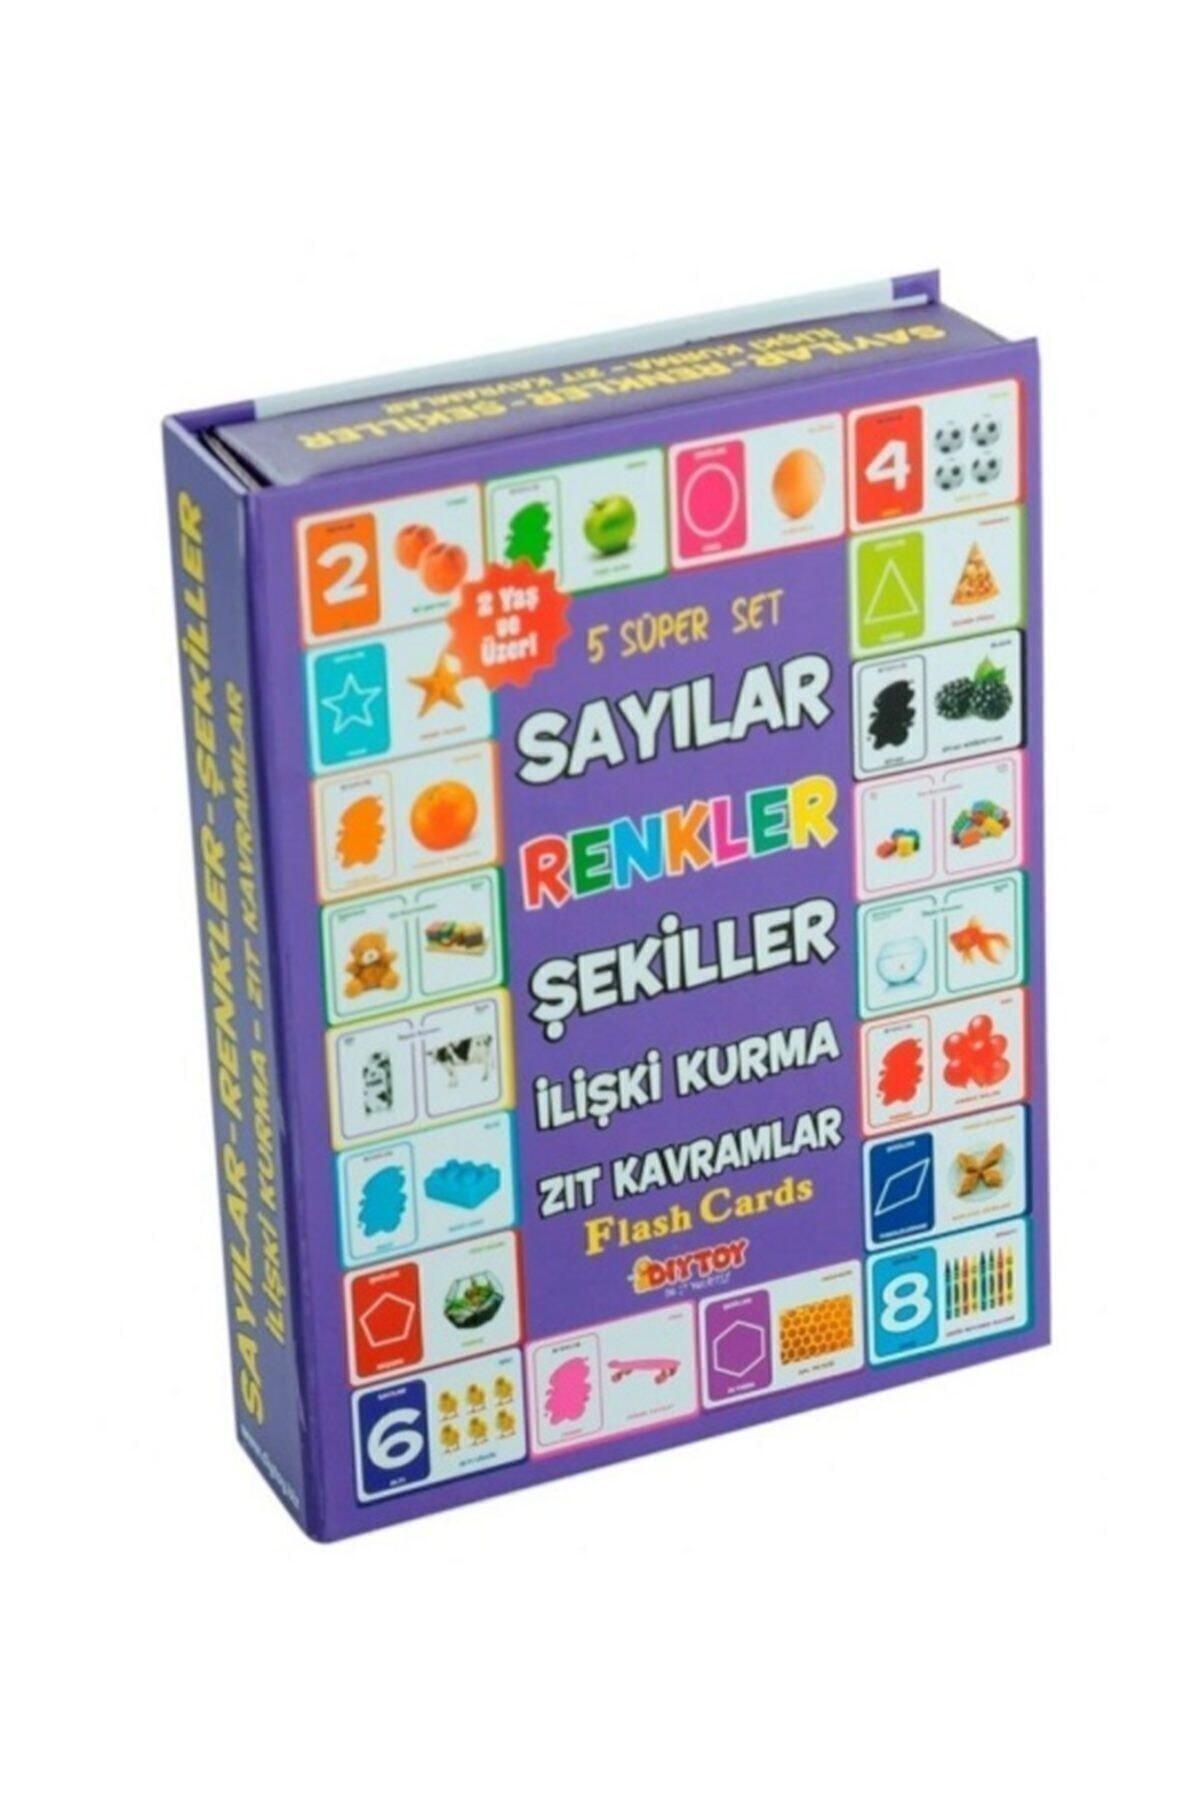 DIYTOY Dıy-toy Flash Cards Süper Set 1